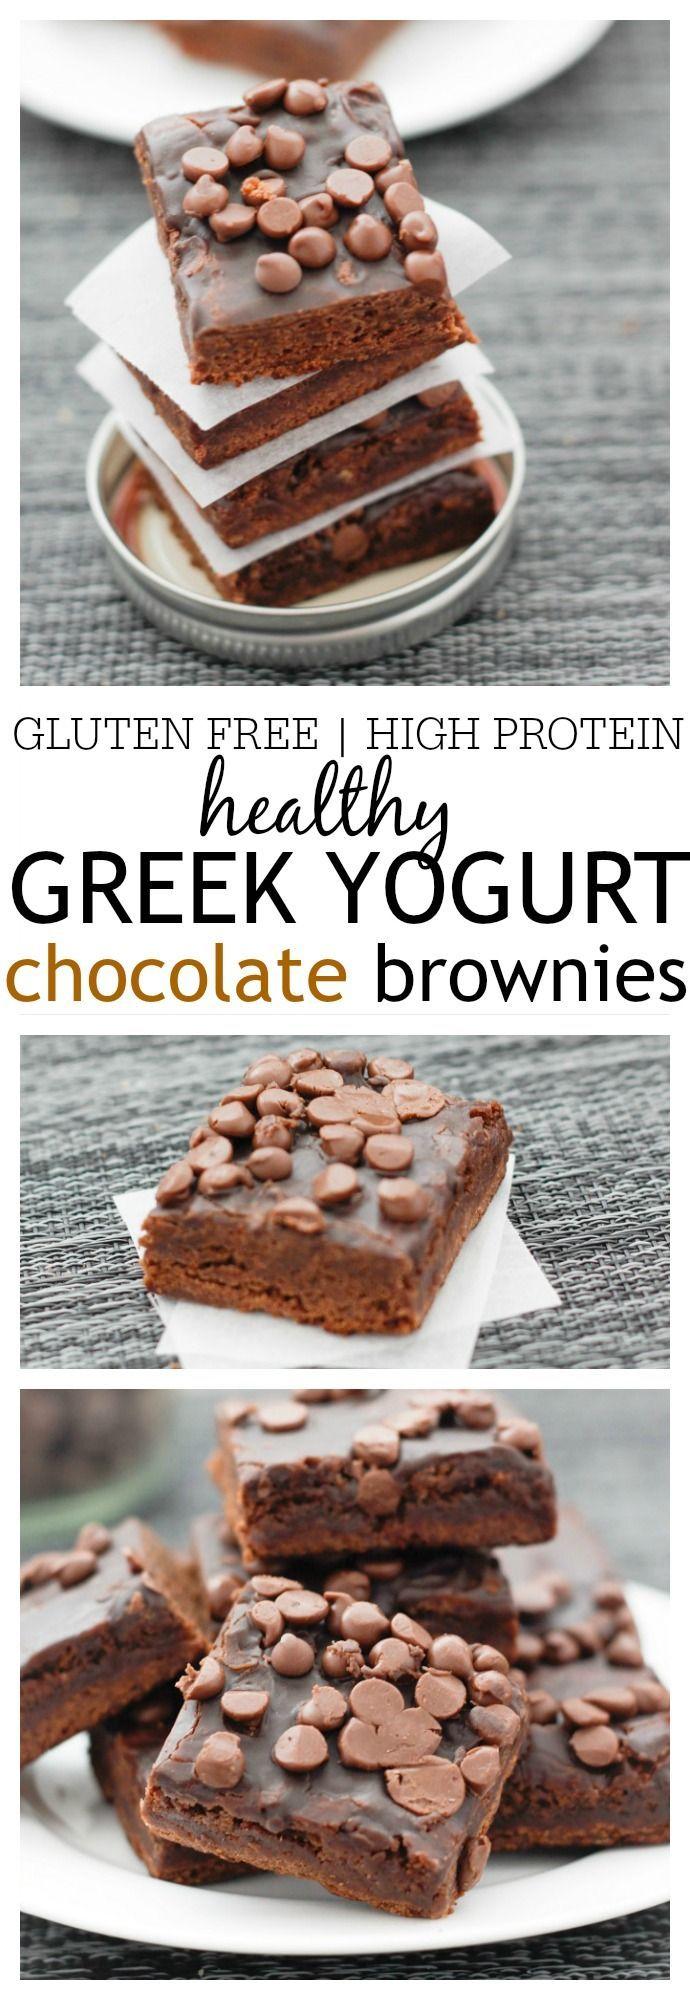 Healthy Greek Yogurt Chocolate Brownies- Extremely fudgy, moist and full of chocolatey goodness- Vegan + GF + high in protein! @thebigmansworld - thebigmansworld.com